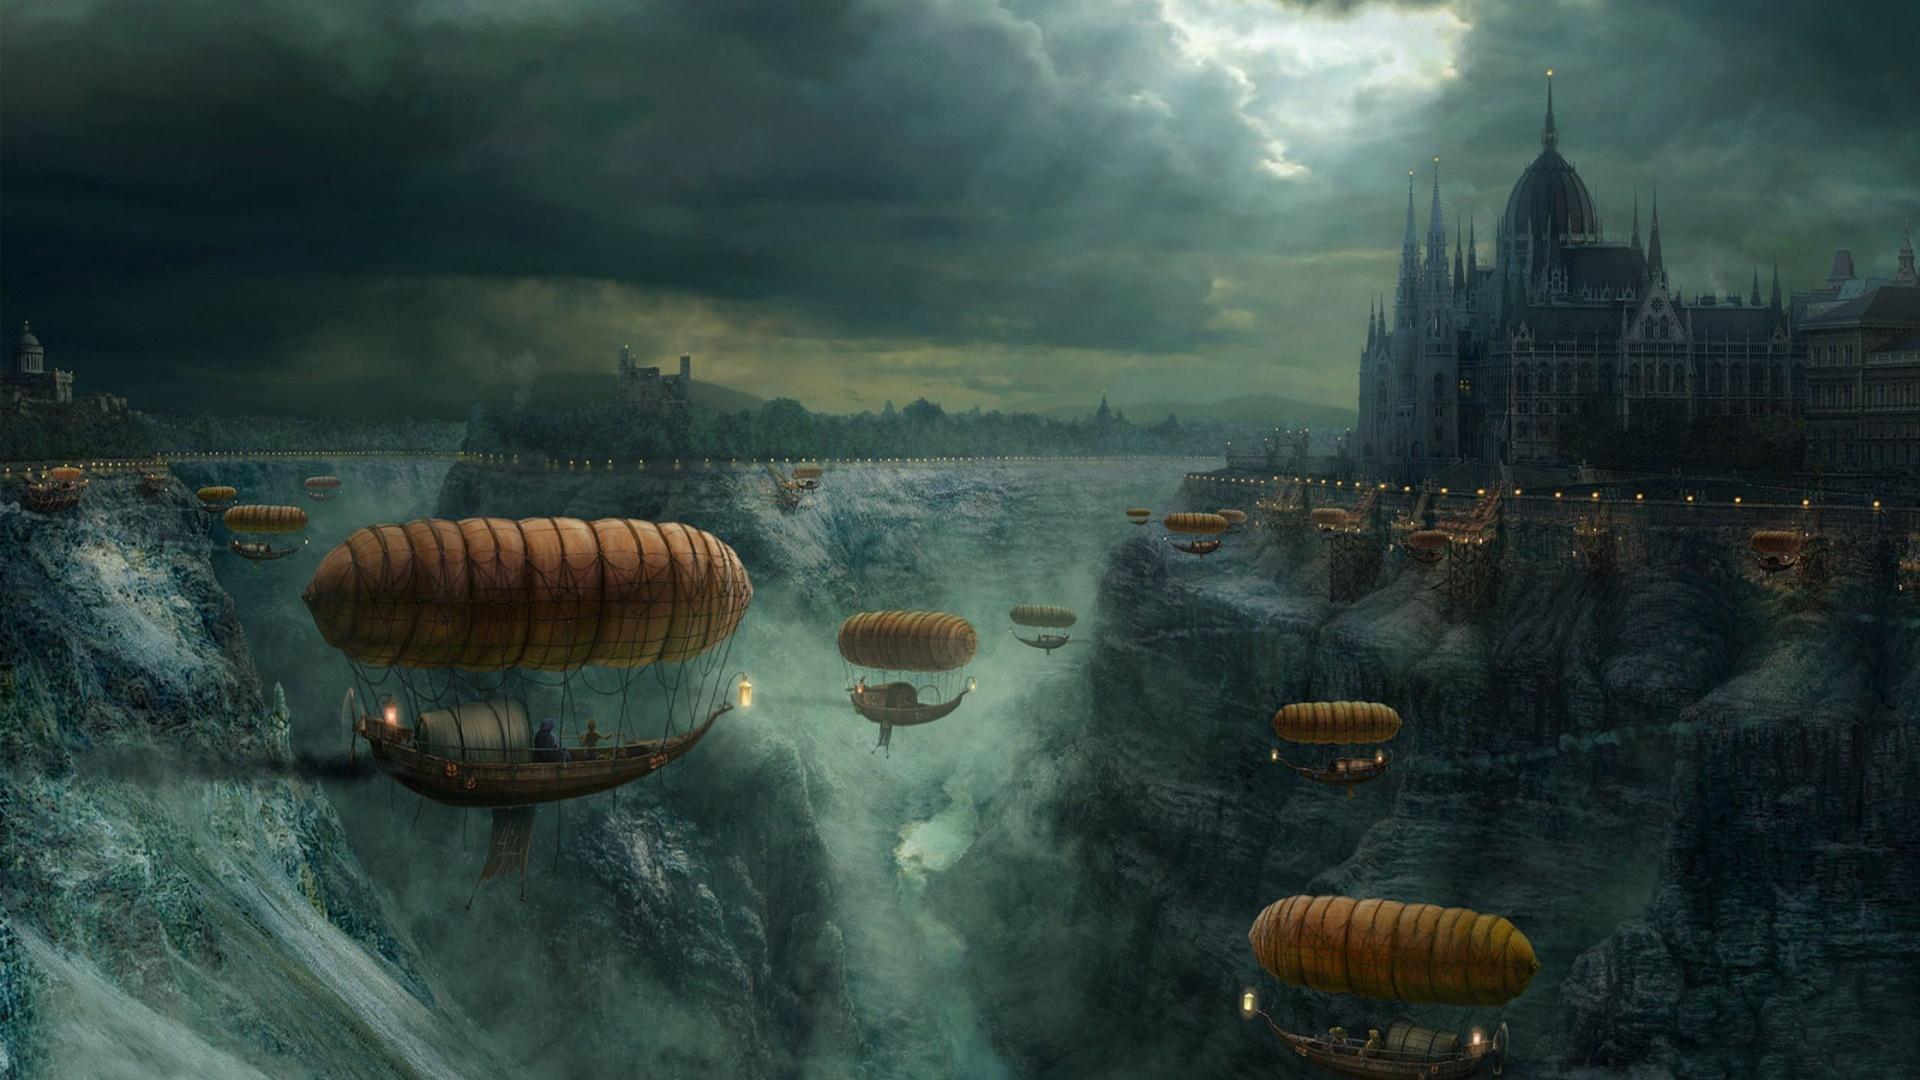 Steampunk fantasy world with airships wallpaper